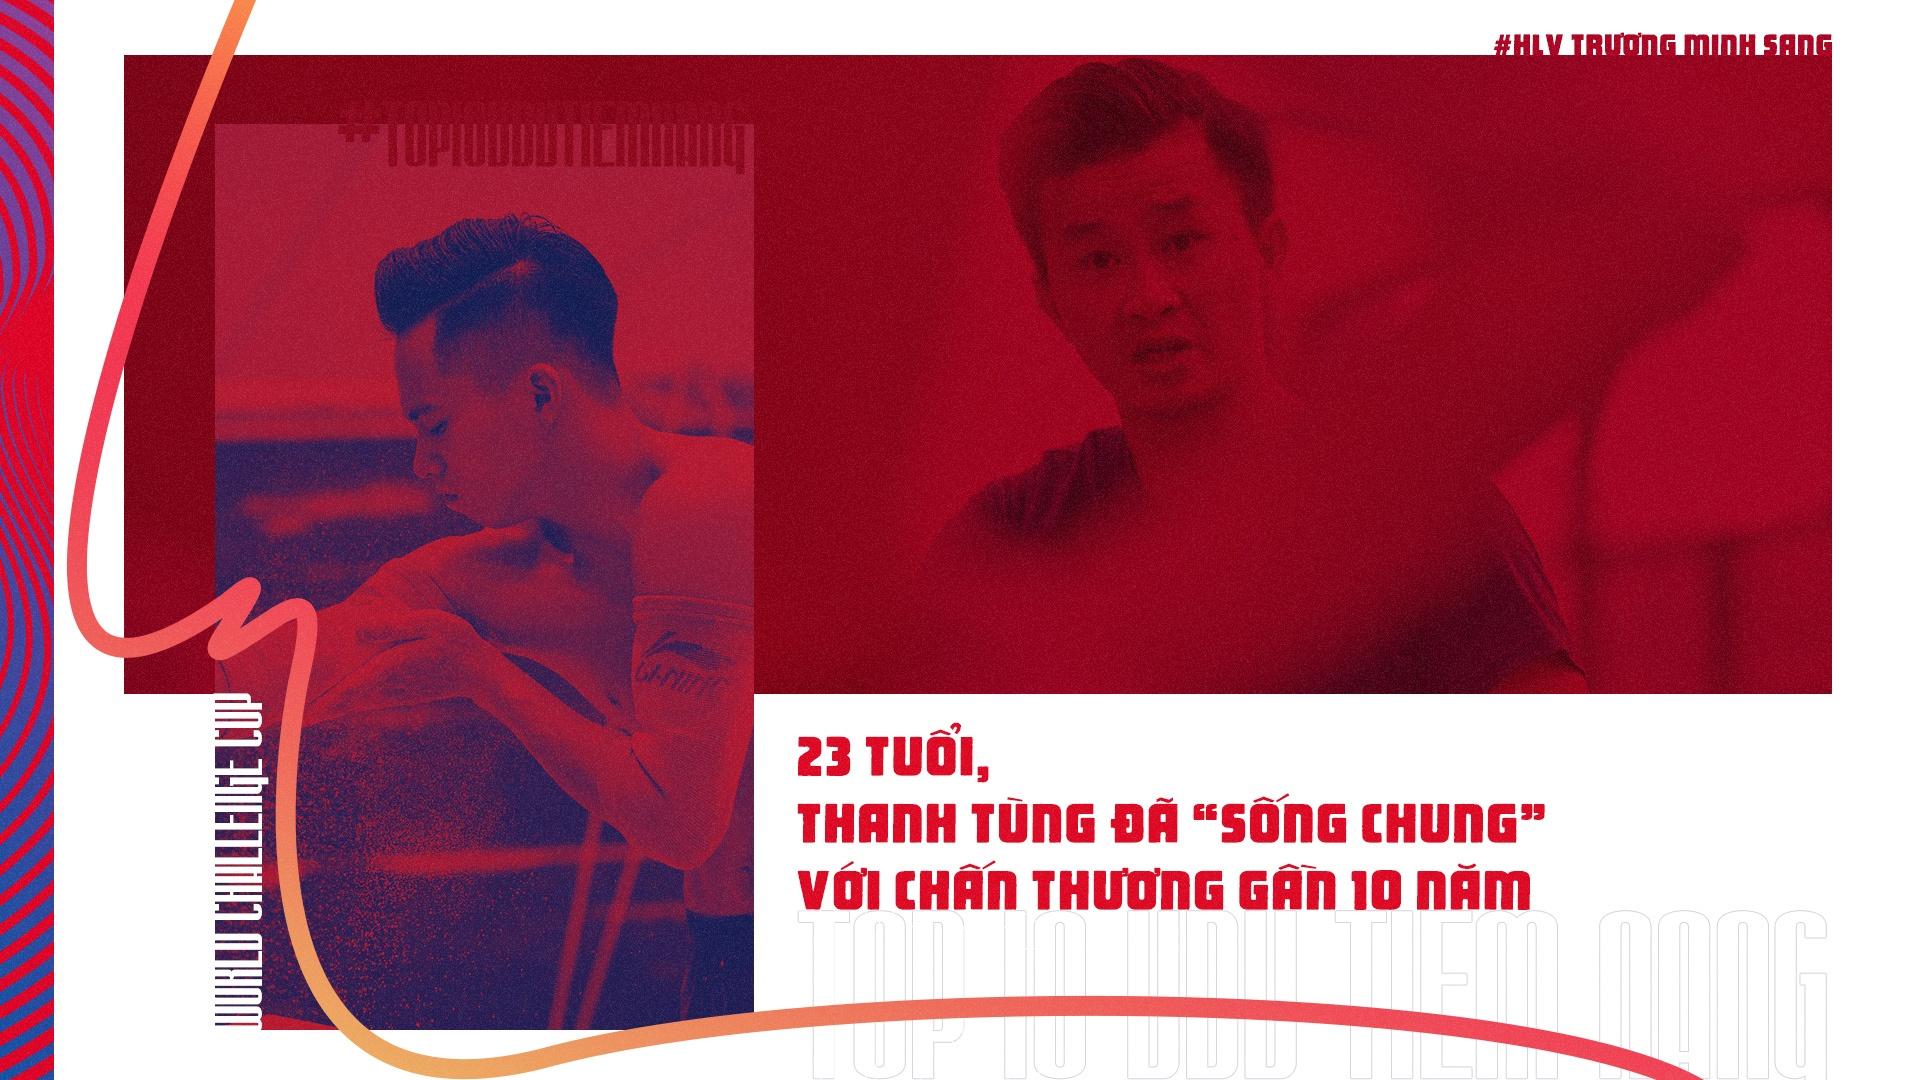 'Hot boy' Le Thanh Tung: 10 nam chan thuong deo bam va giac mo Olympic hinh anh 7